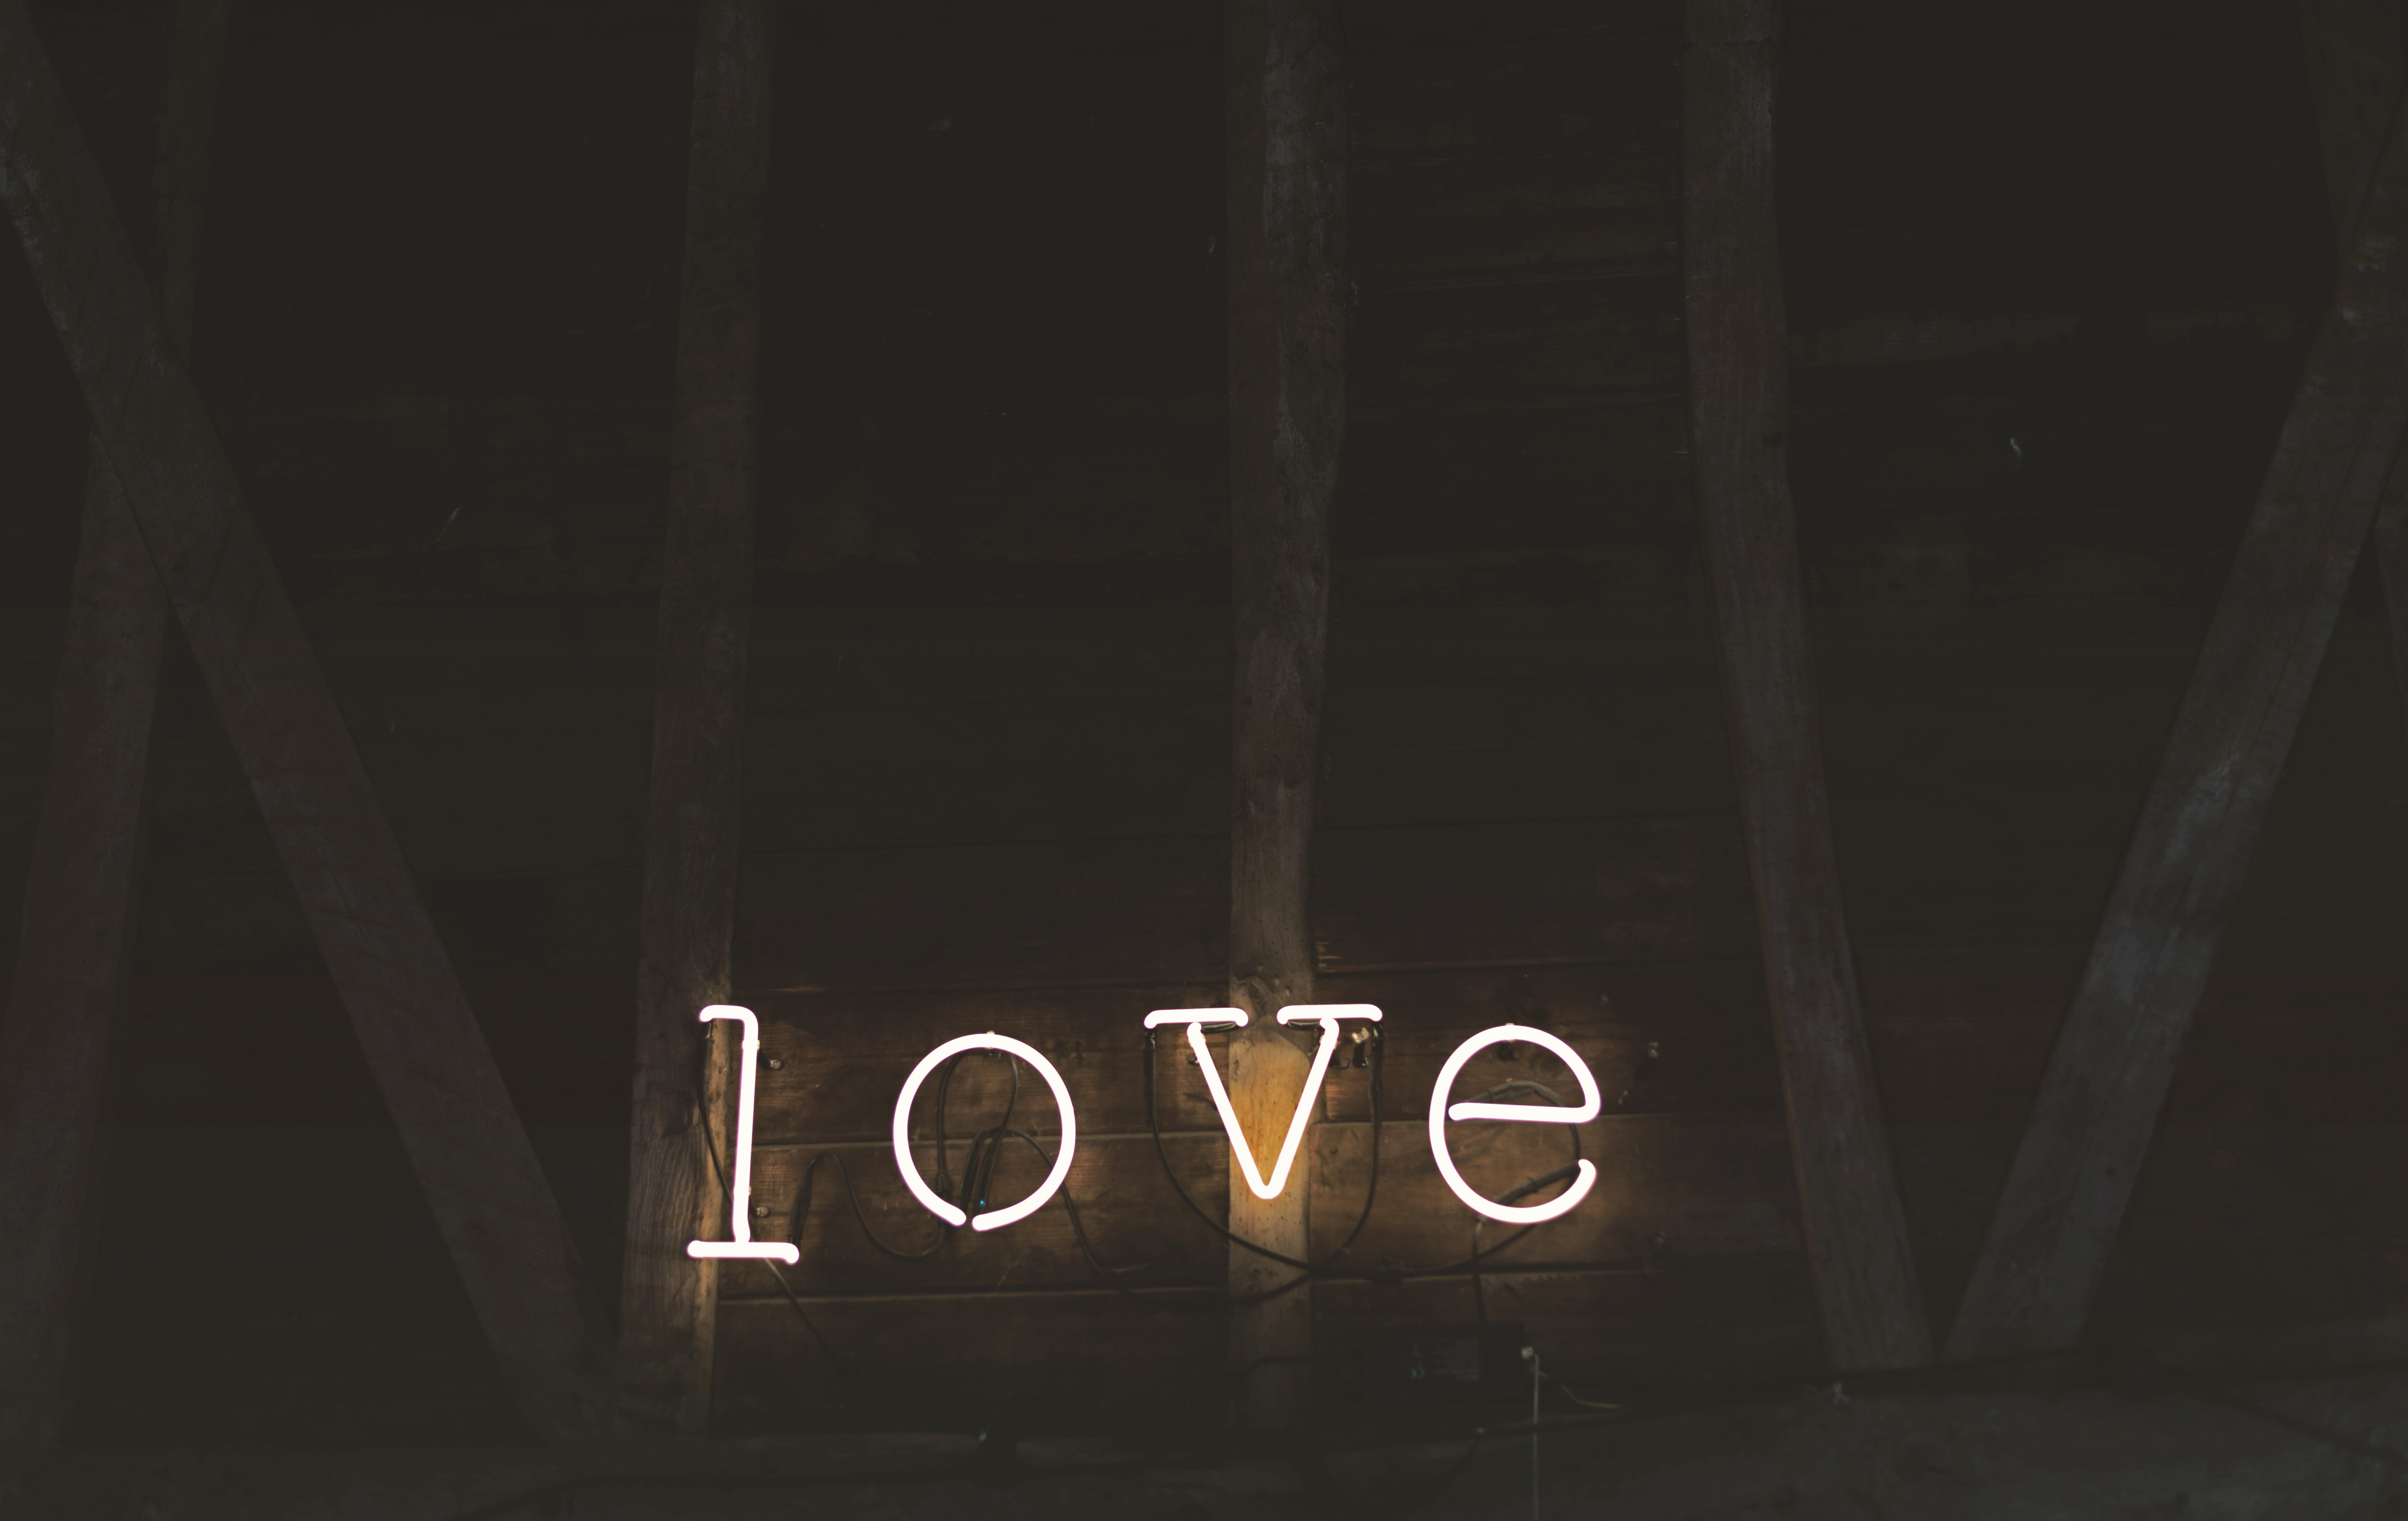 millie amor